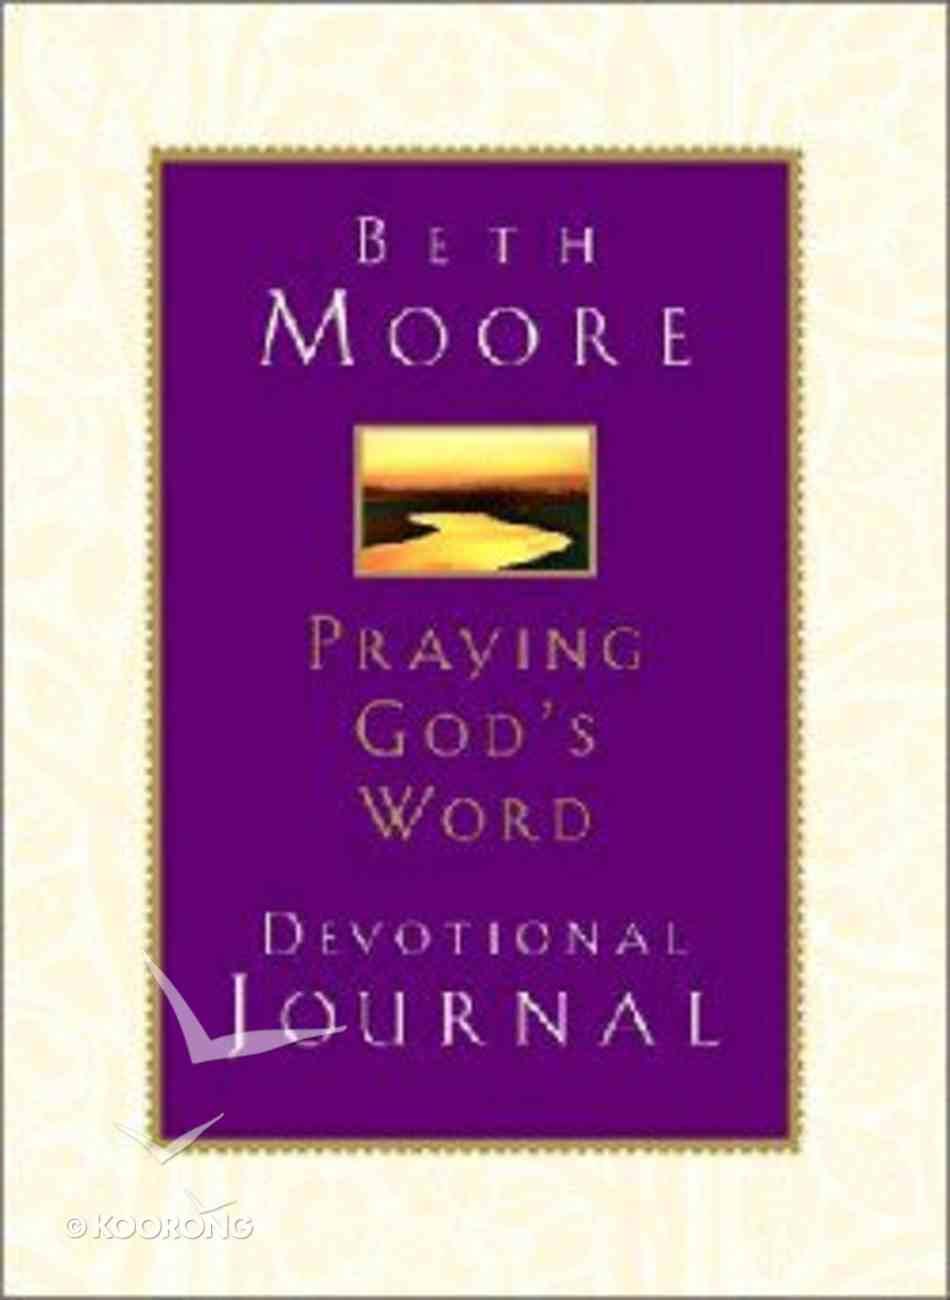 Praying God's Word (Devotional Journal) Hardback